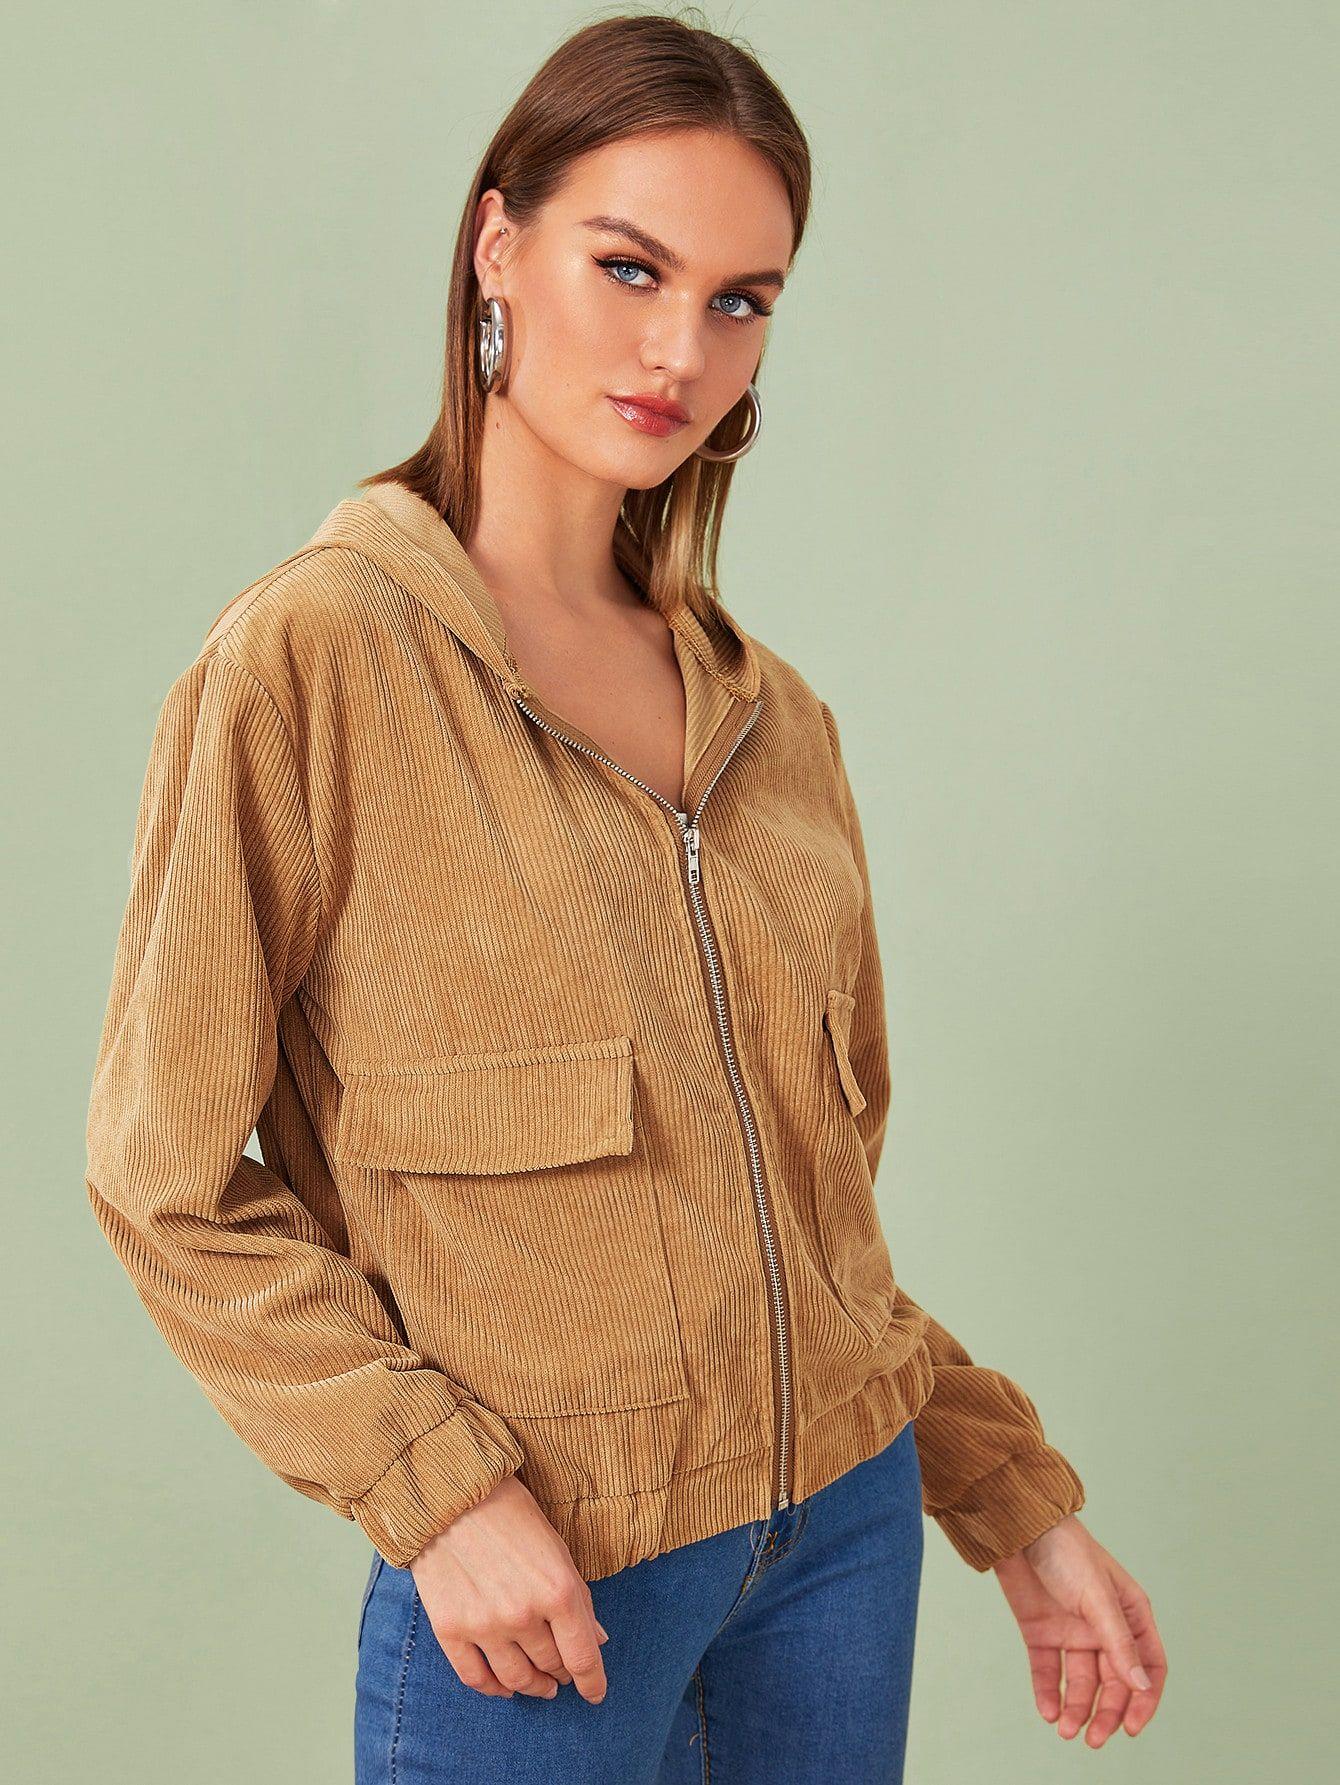 Corduroy Flap Pocket Zipper Hooded Jacket Sponsored